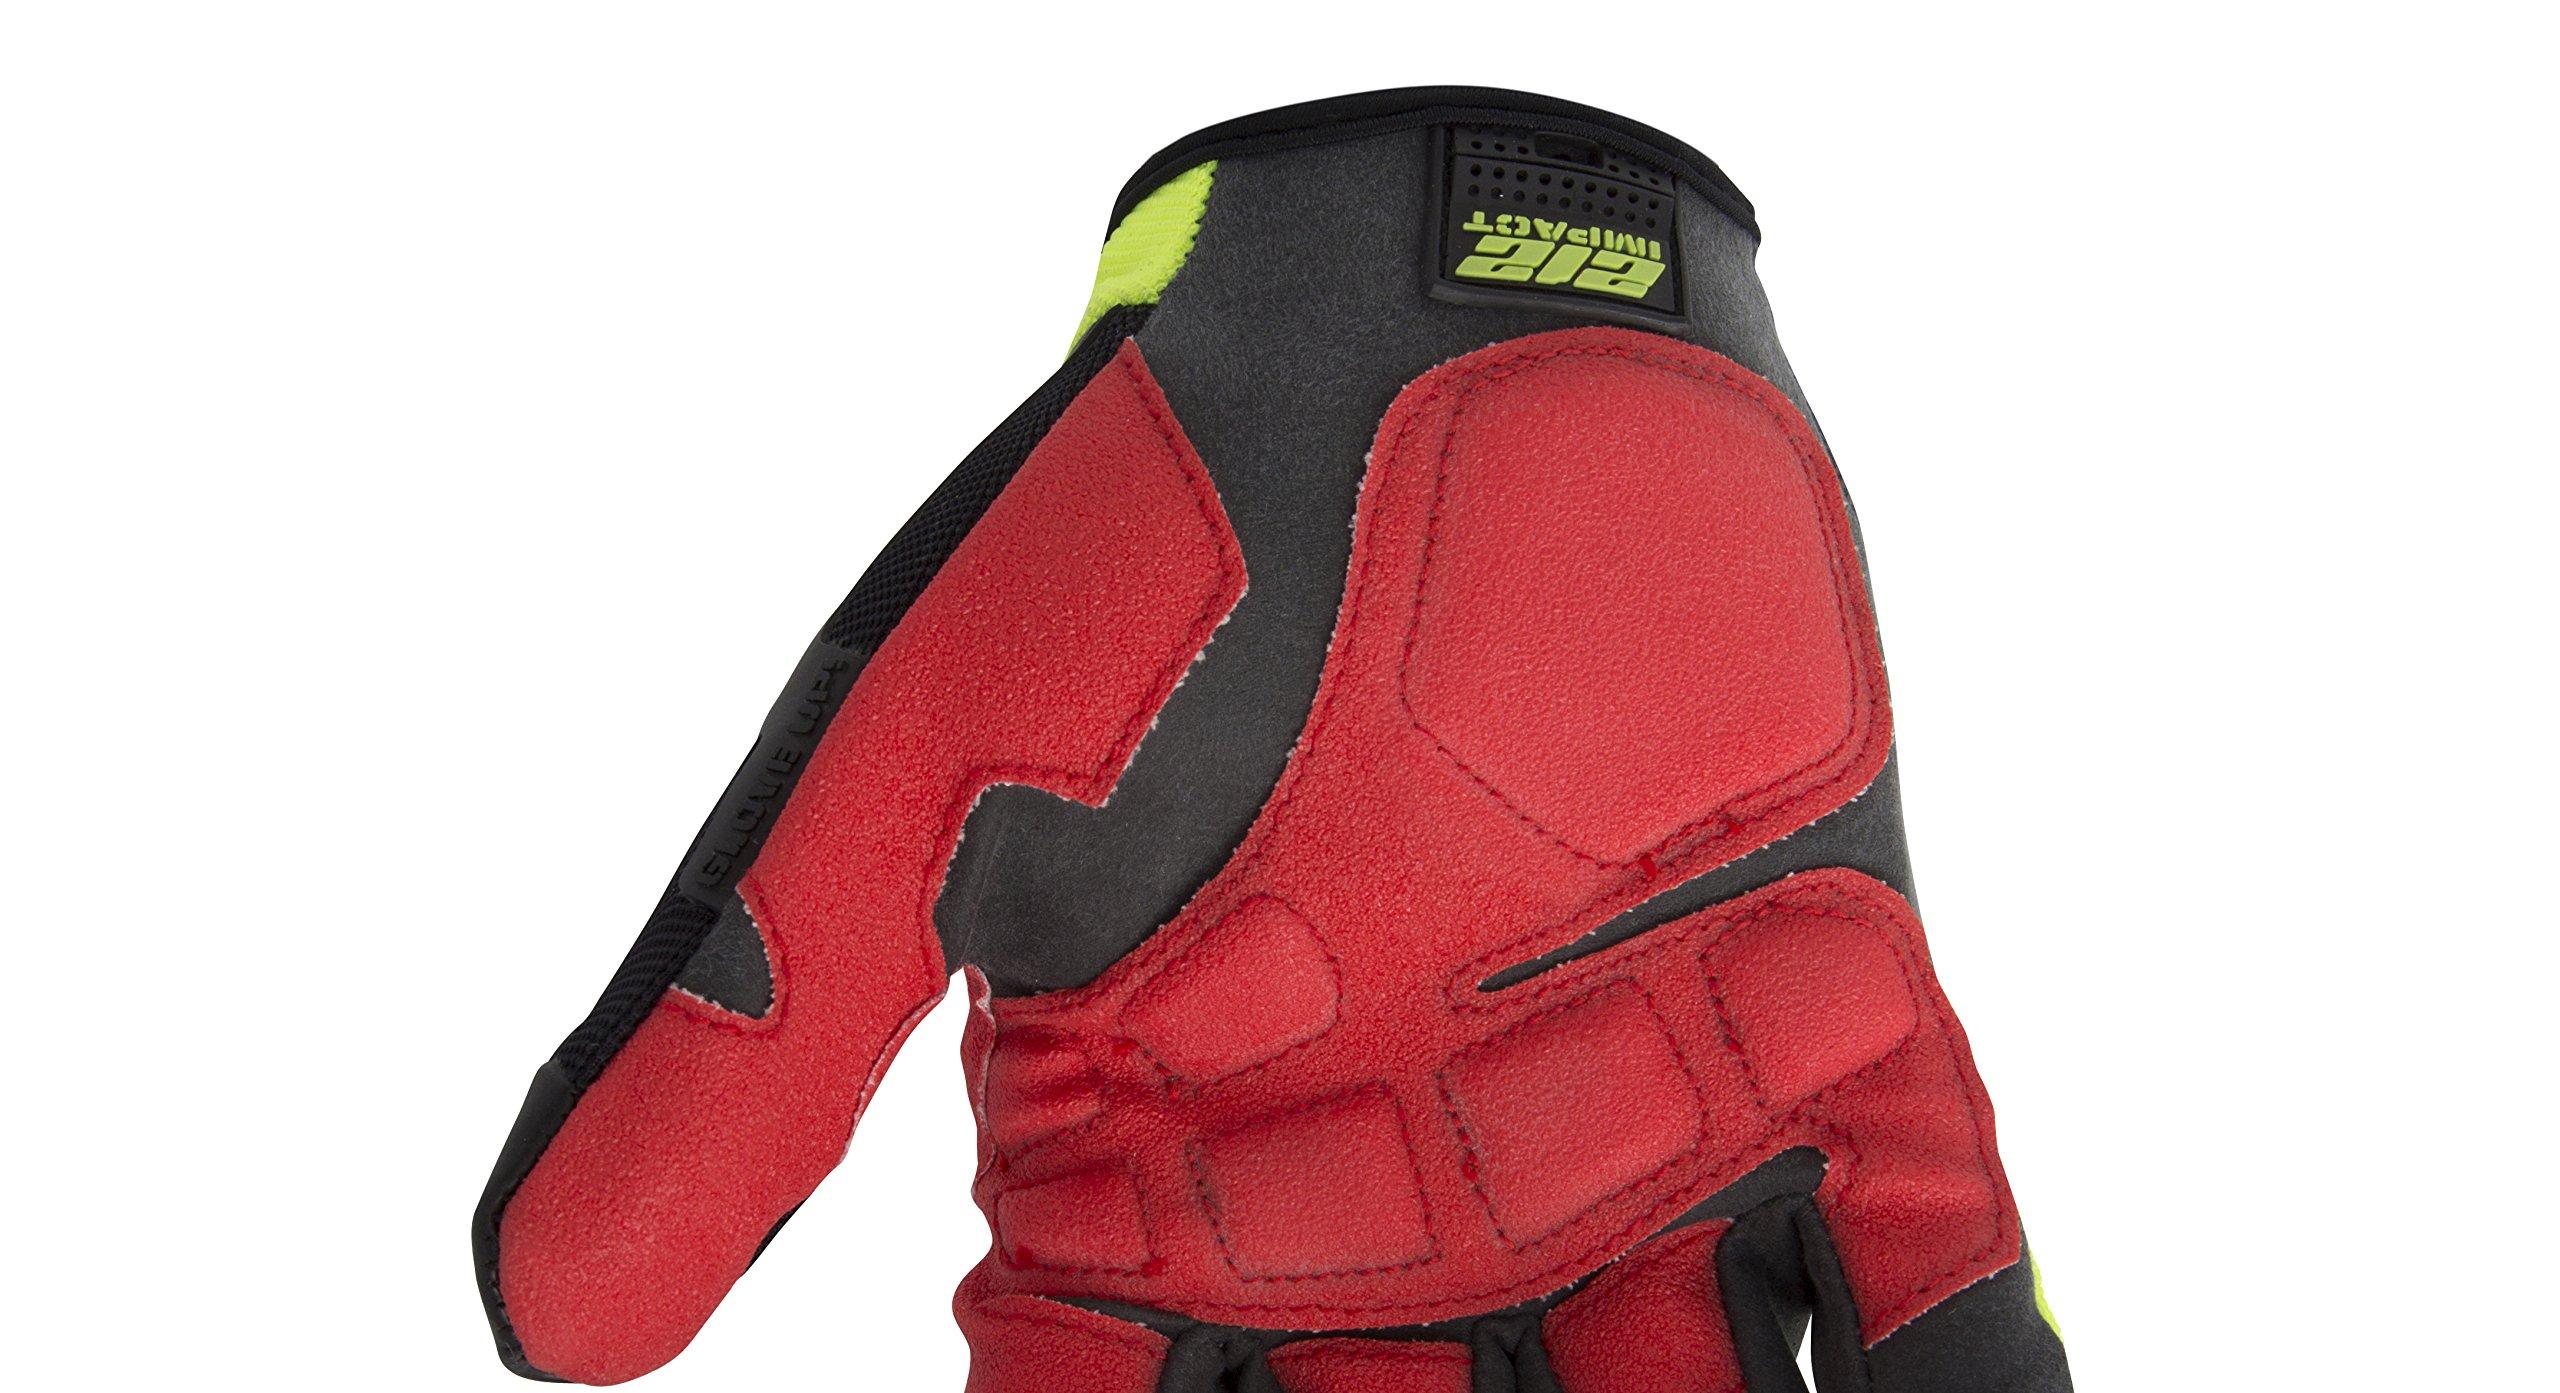 212 Performance Gloves IMP-88-009 Super Hi-Vis Impact Gloves, Medium by 212 Performance Gloves (Image #6)